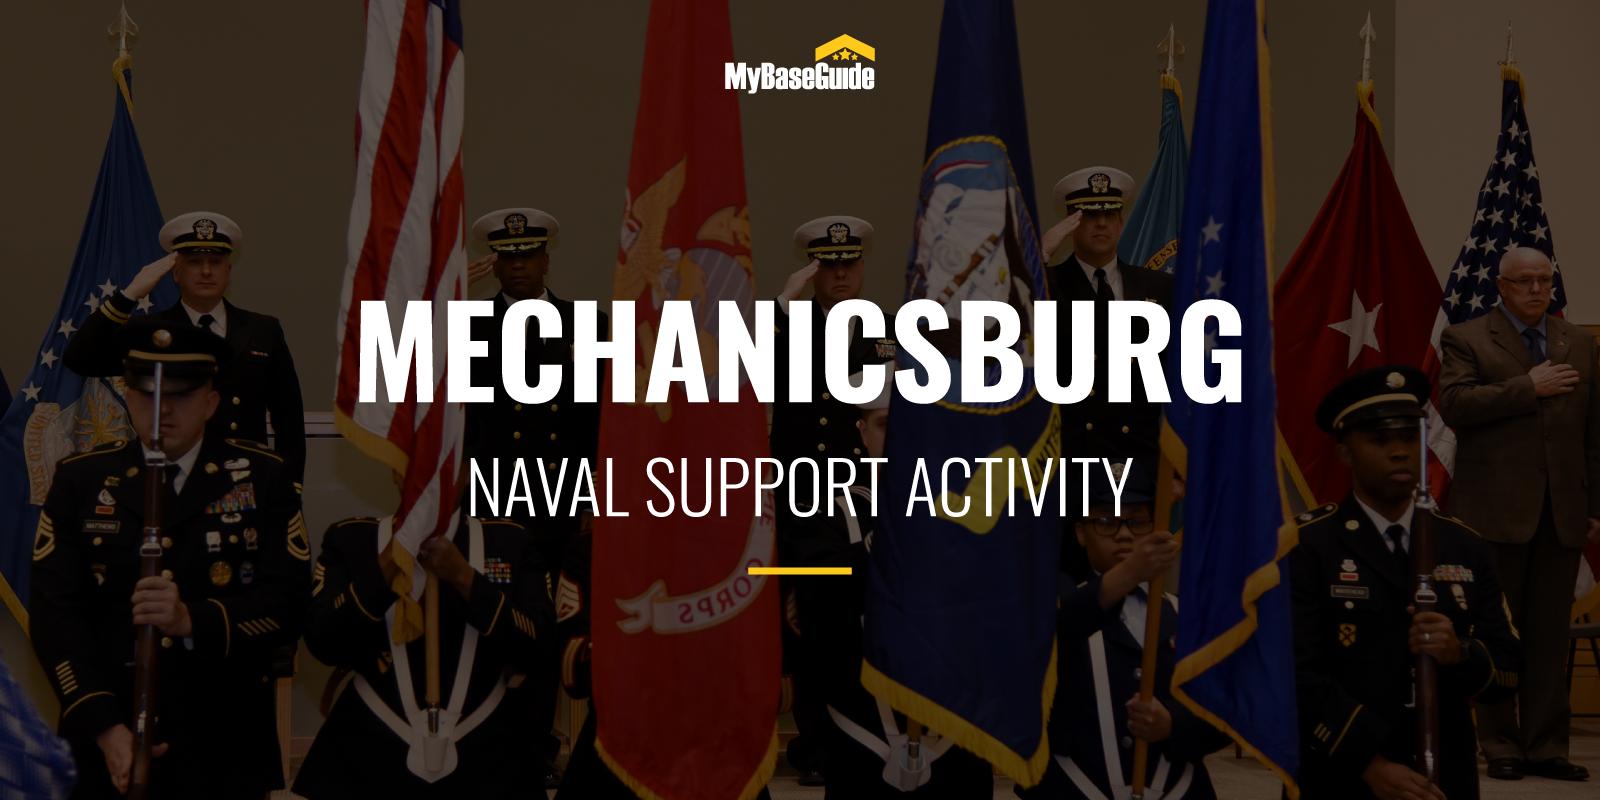 Naval Support Activity Mechanicsburg